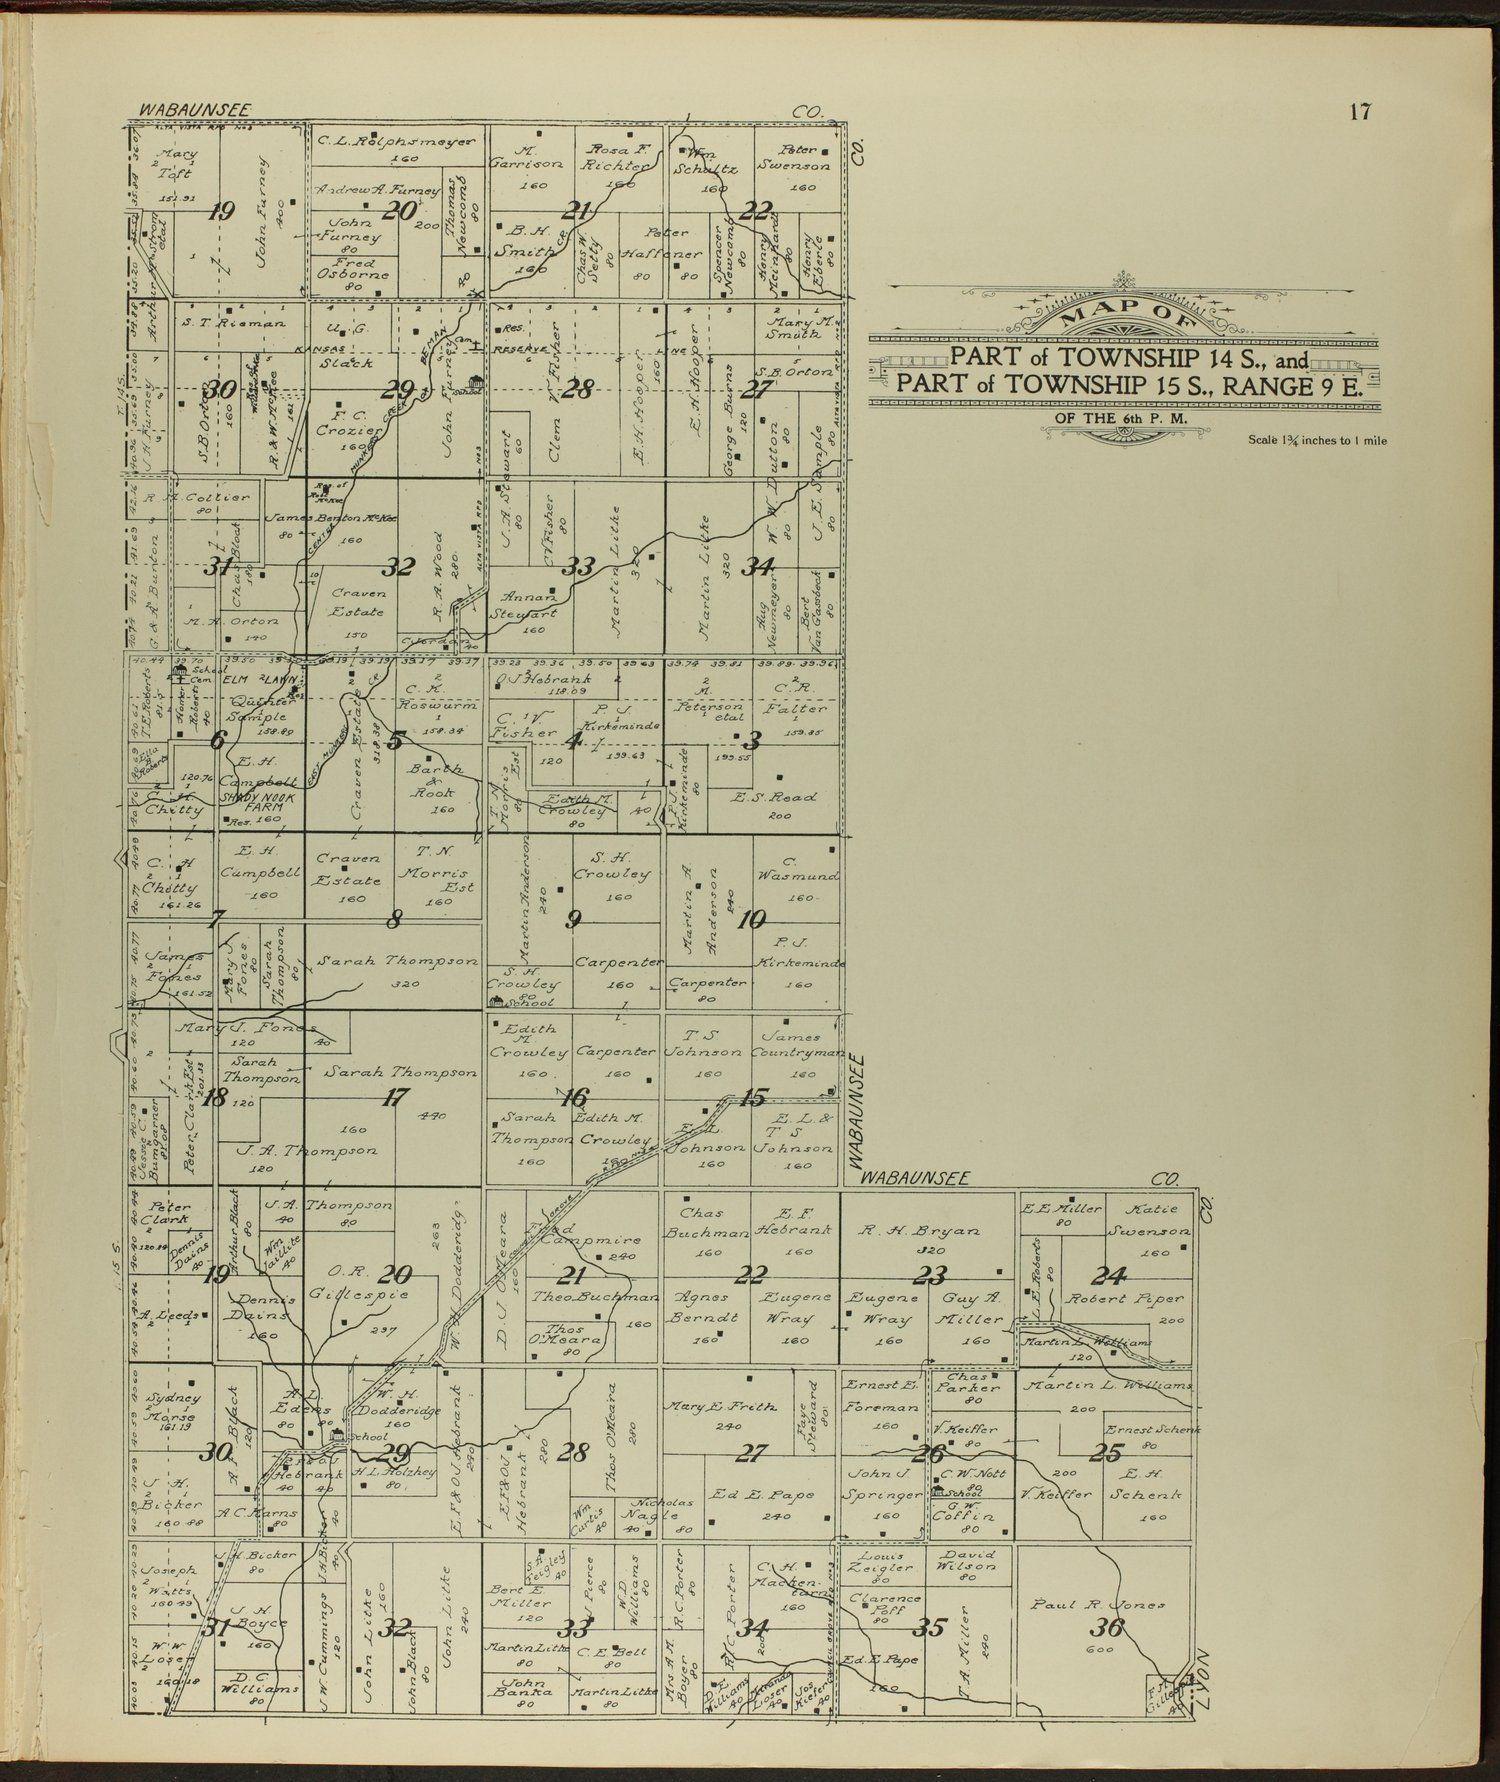 Kansas morris county dwight - Standard Atlas Of Morris County Kansas 17